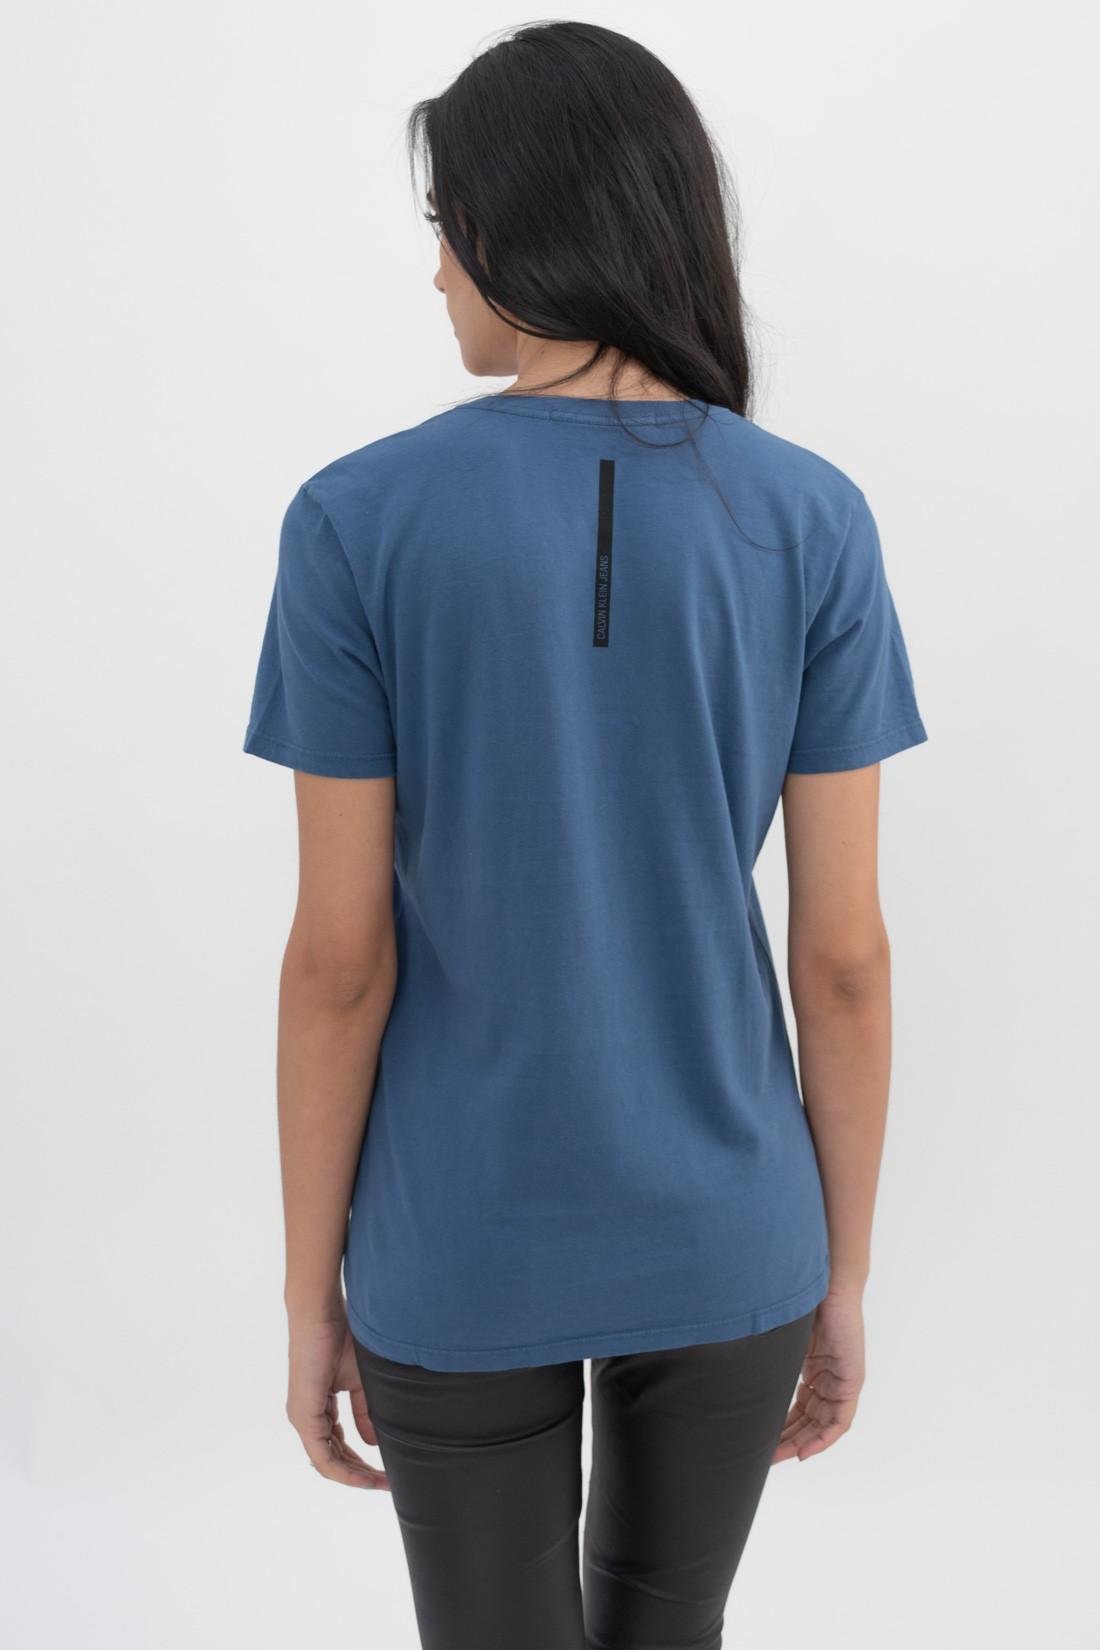 T Shirt Calvin Klein Etiqueta